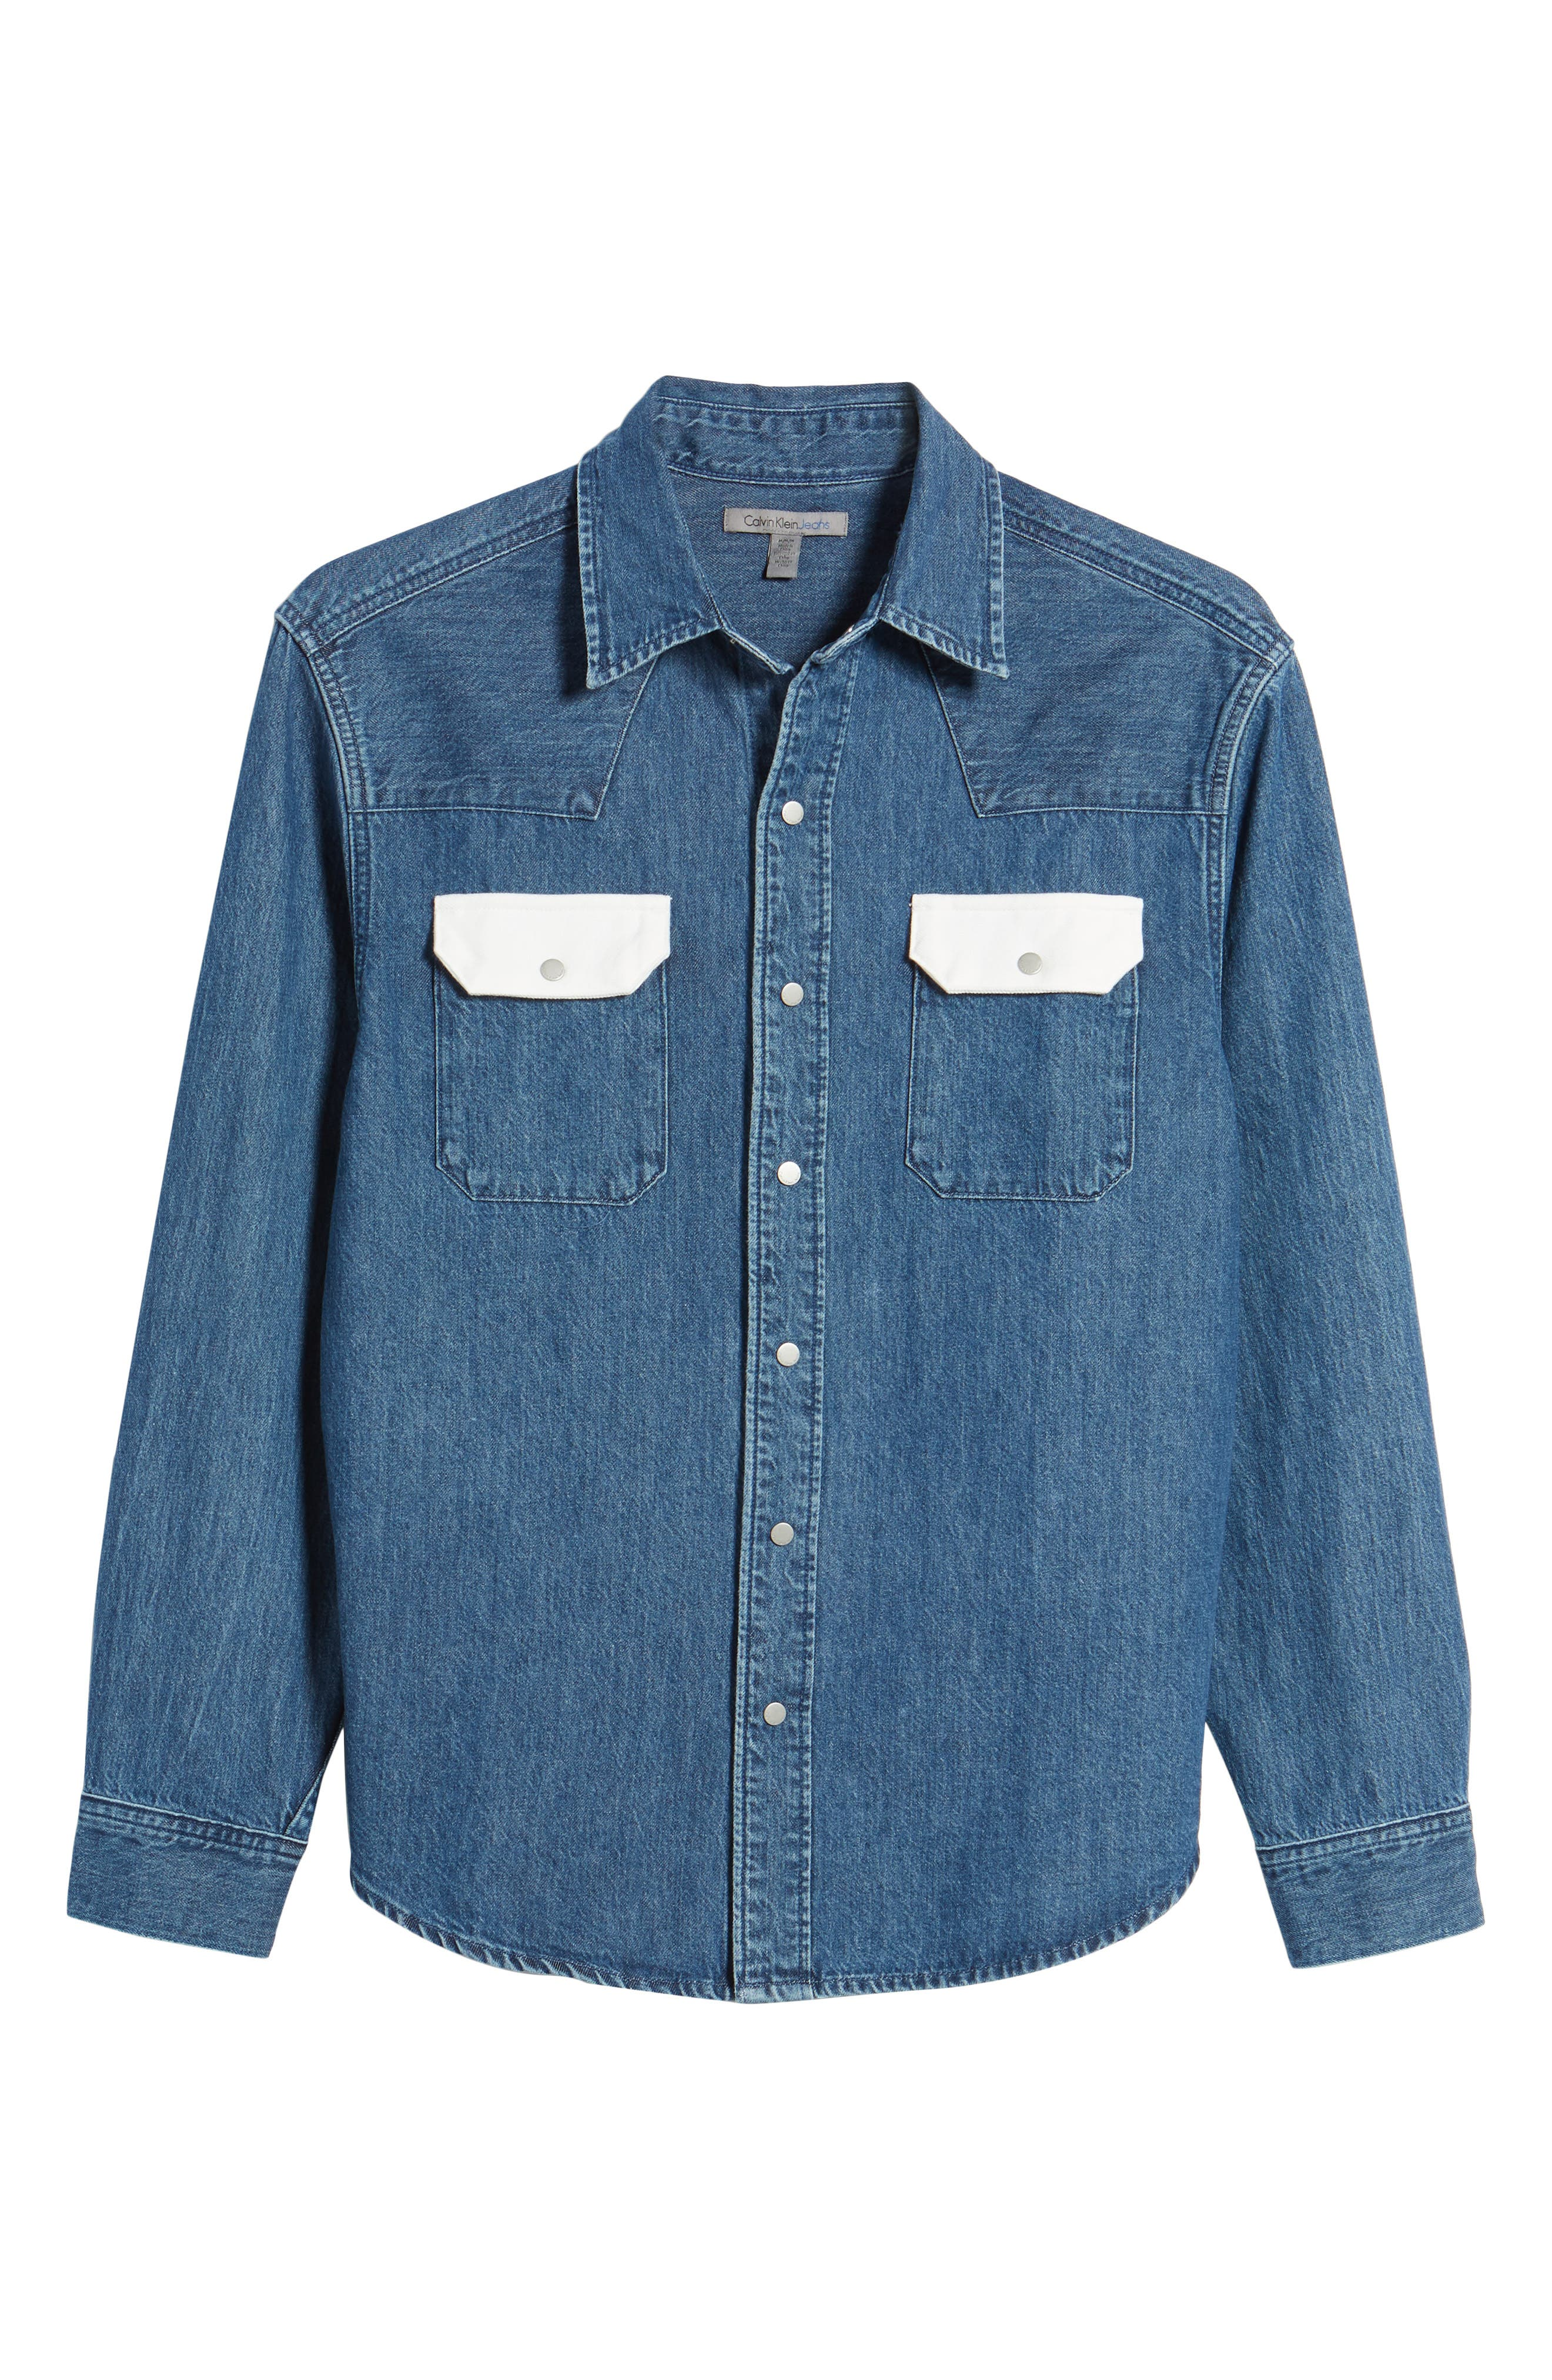 Calvin Klein Archive Colorblock Denim Western Shirt,                             Alternate thumbnail 6, color,                             400